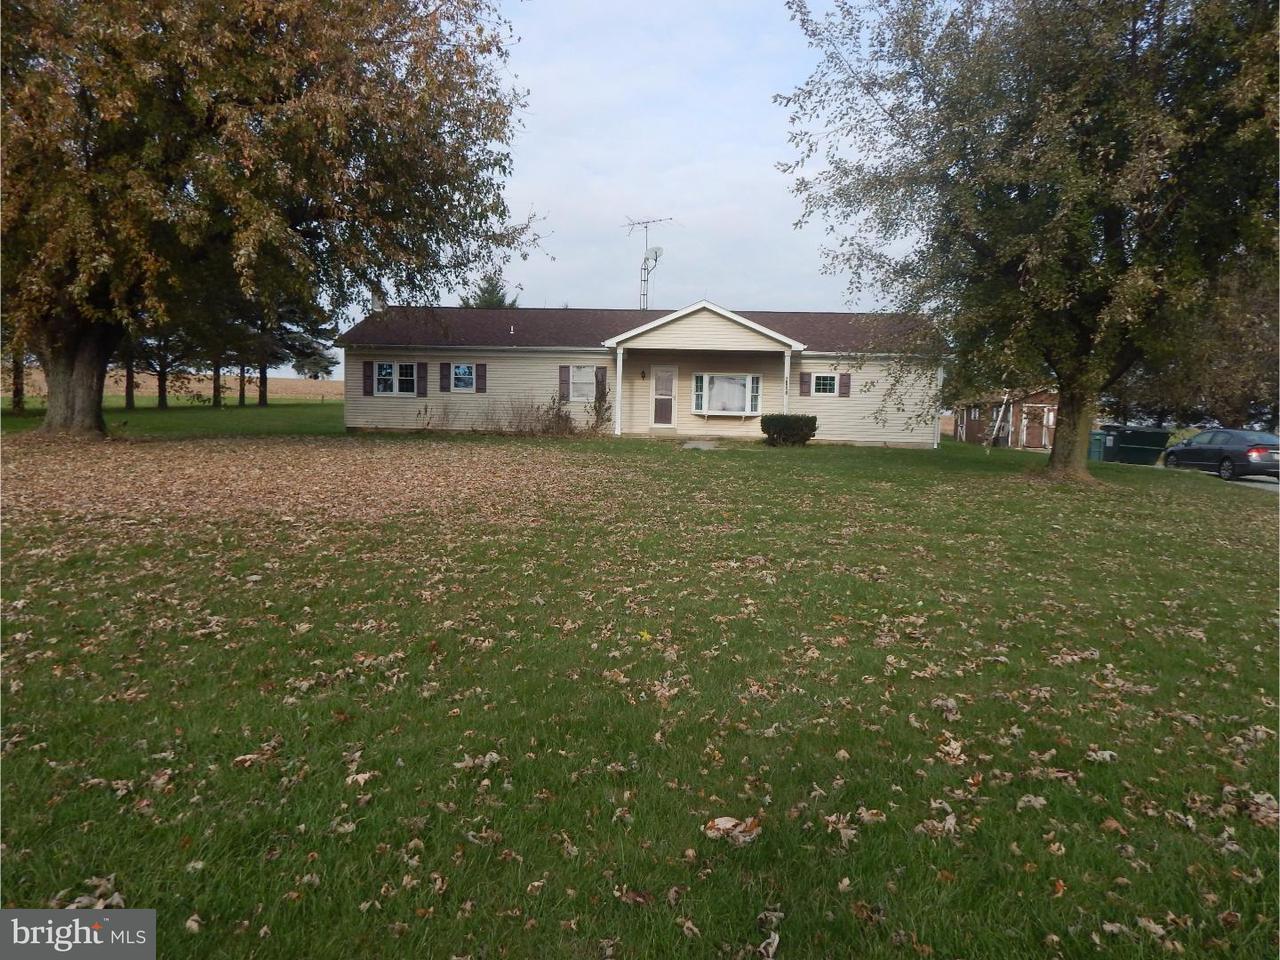 Single Family Home for Sale at 1677 KIRKWOOD PIKE Kirkwood, Pennsylvania 17536 United States